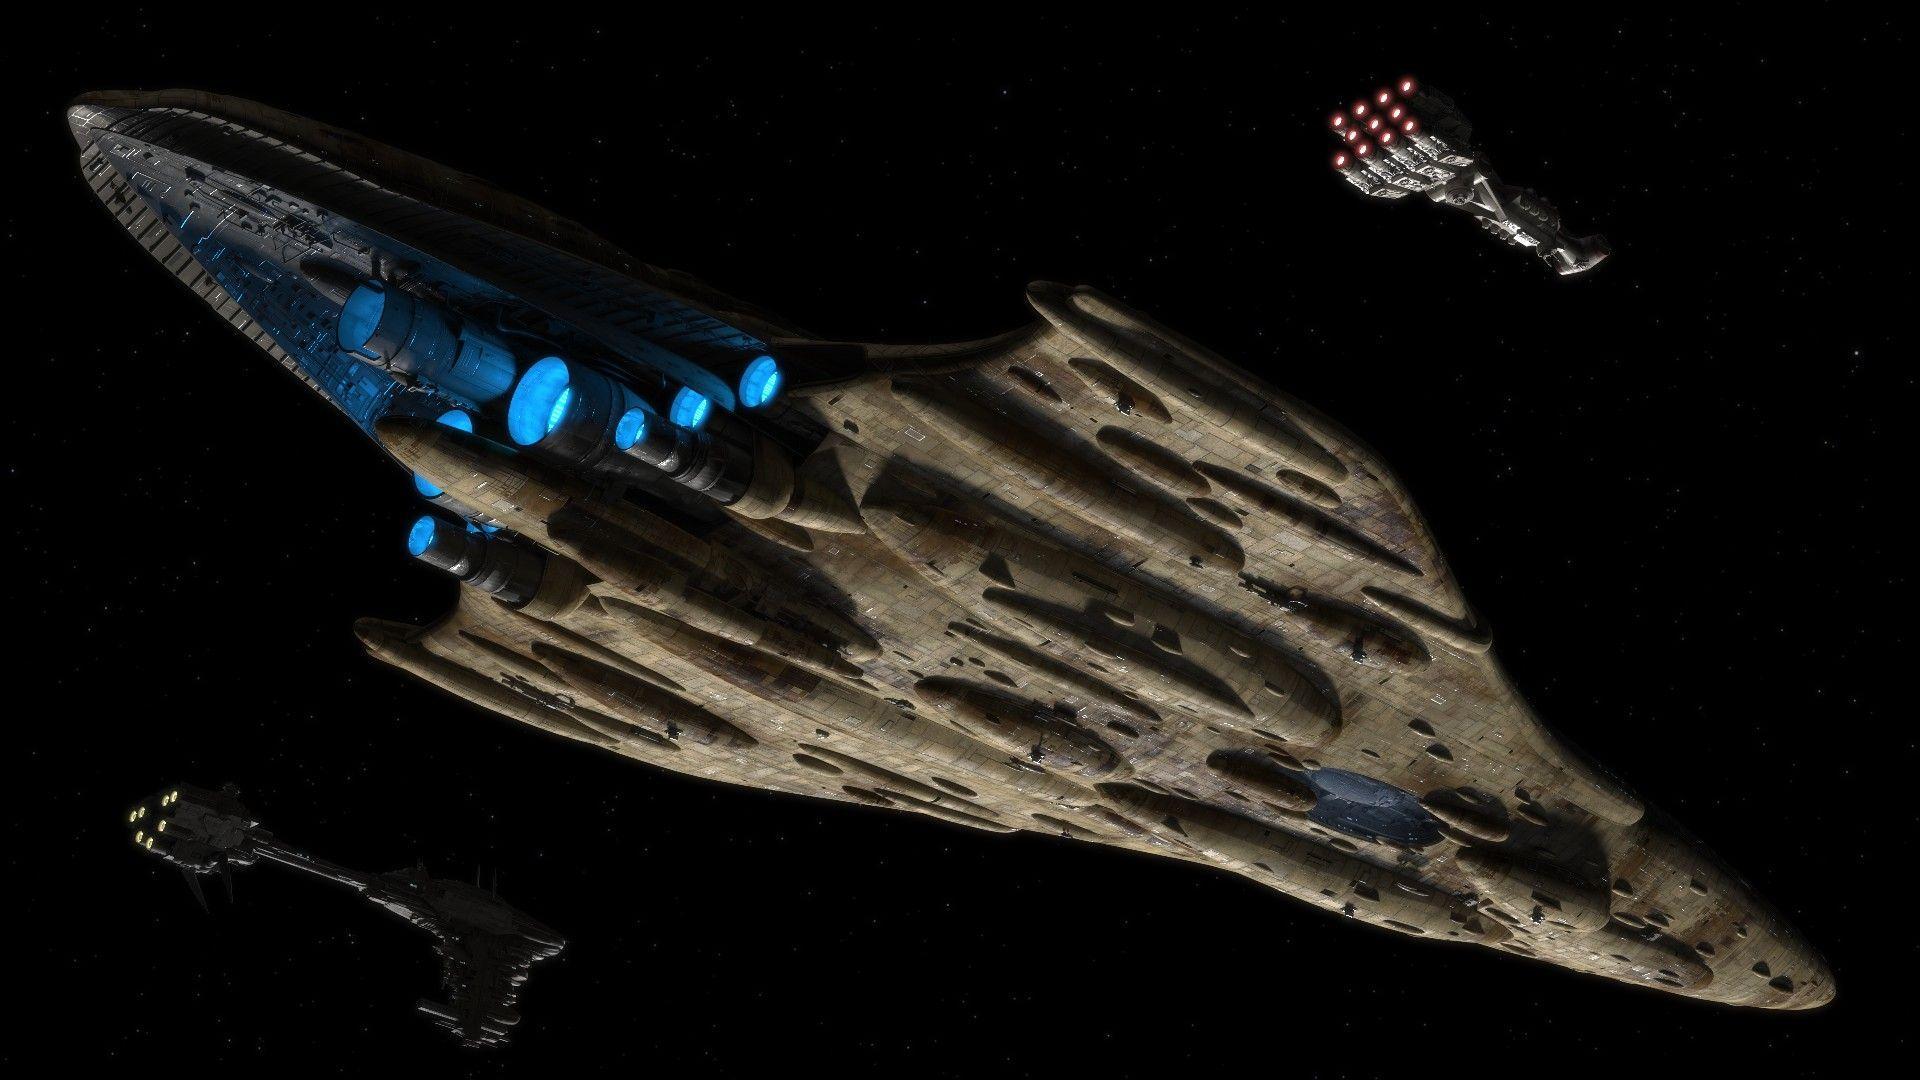 Mon Calamari Cruiser Star Wars Wallpaper Star Wars Vehicles